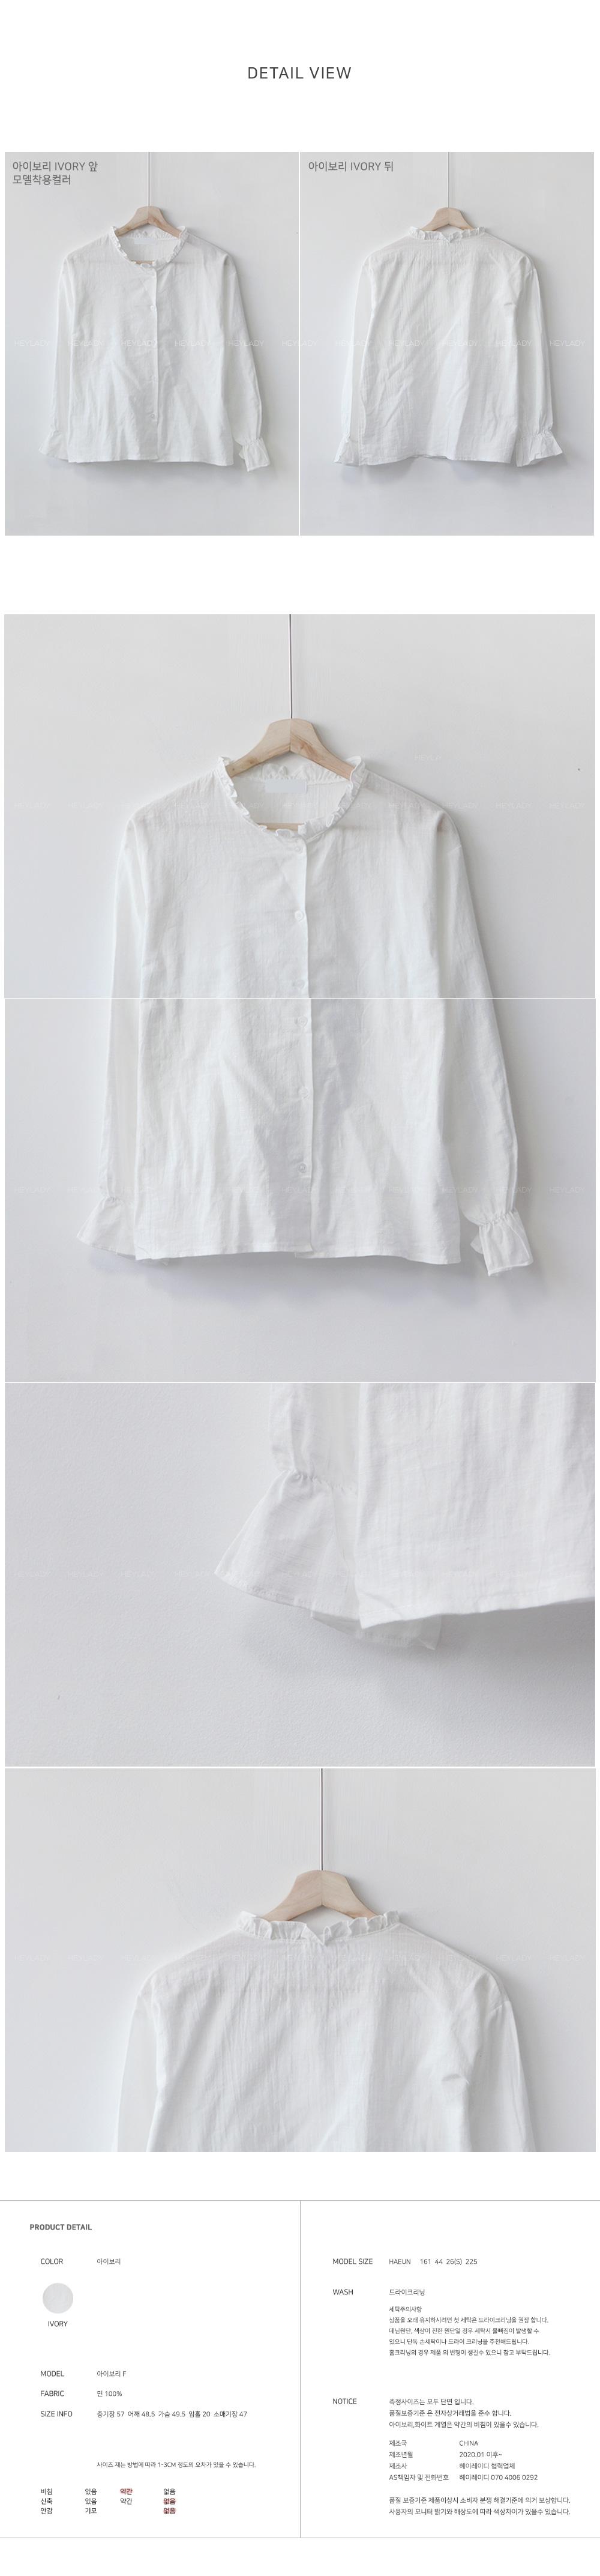 David ruffle blouse